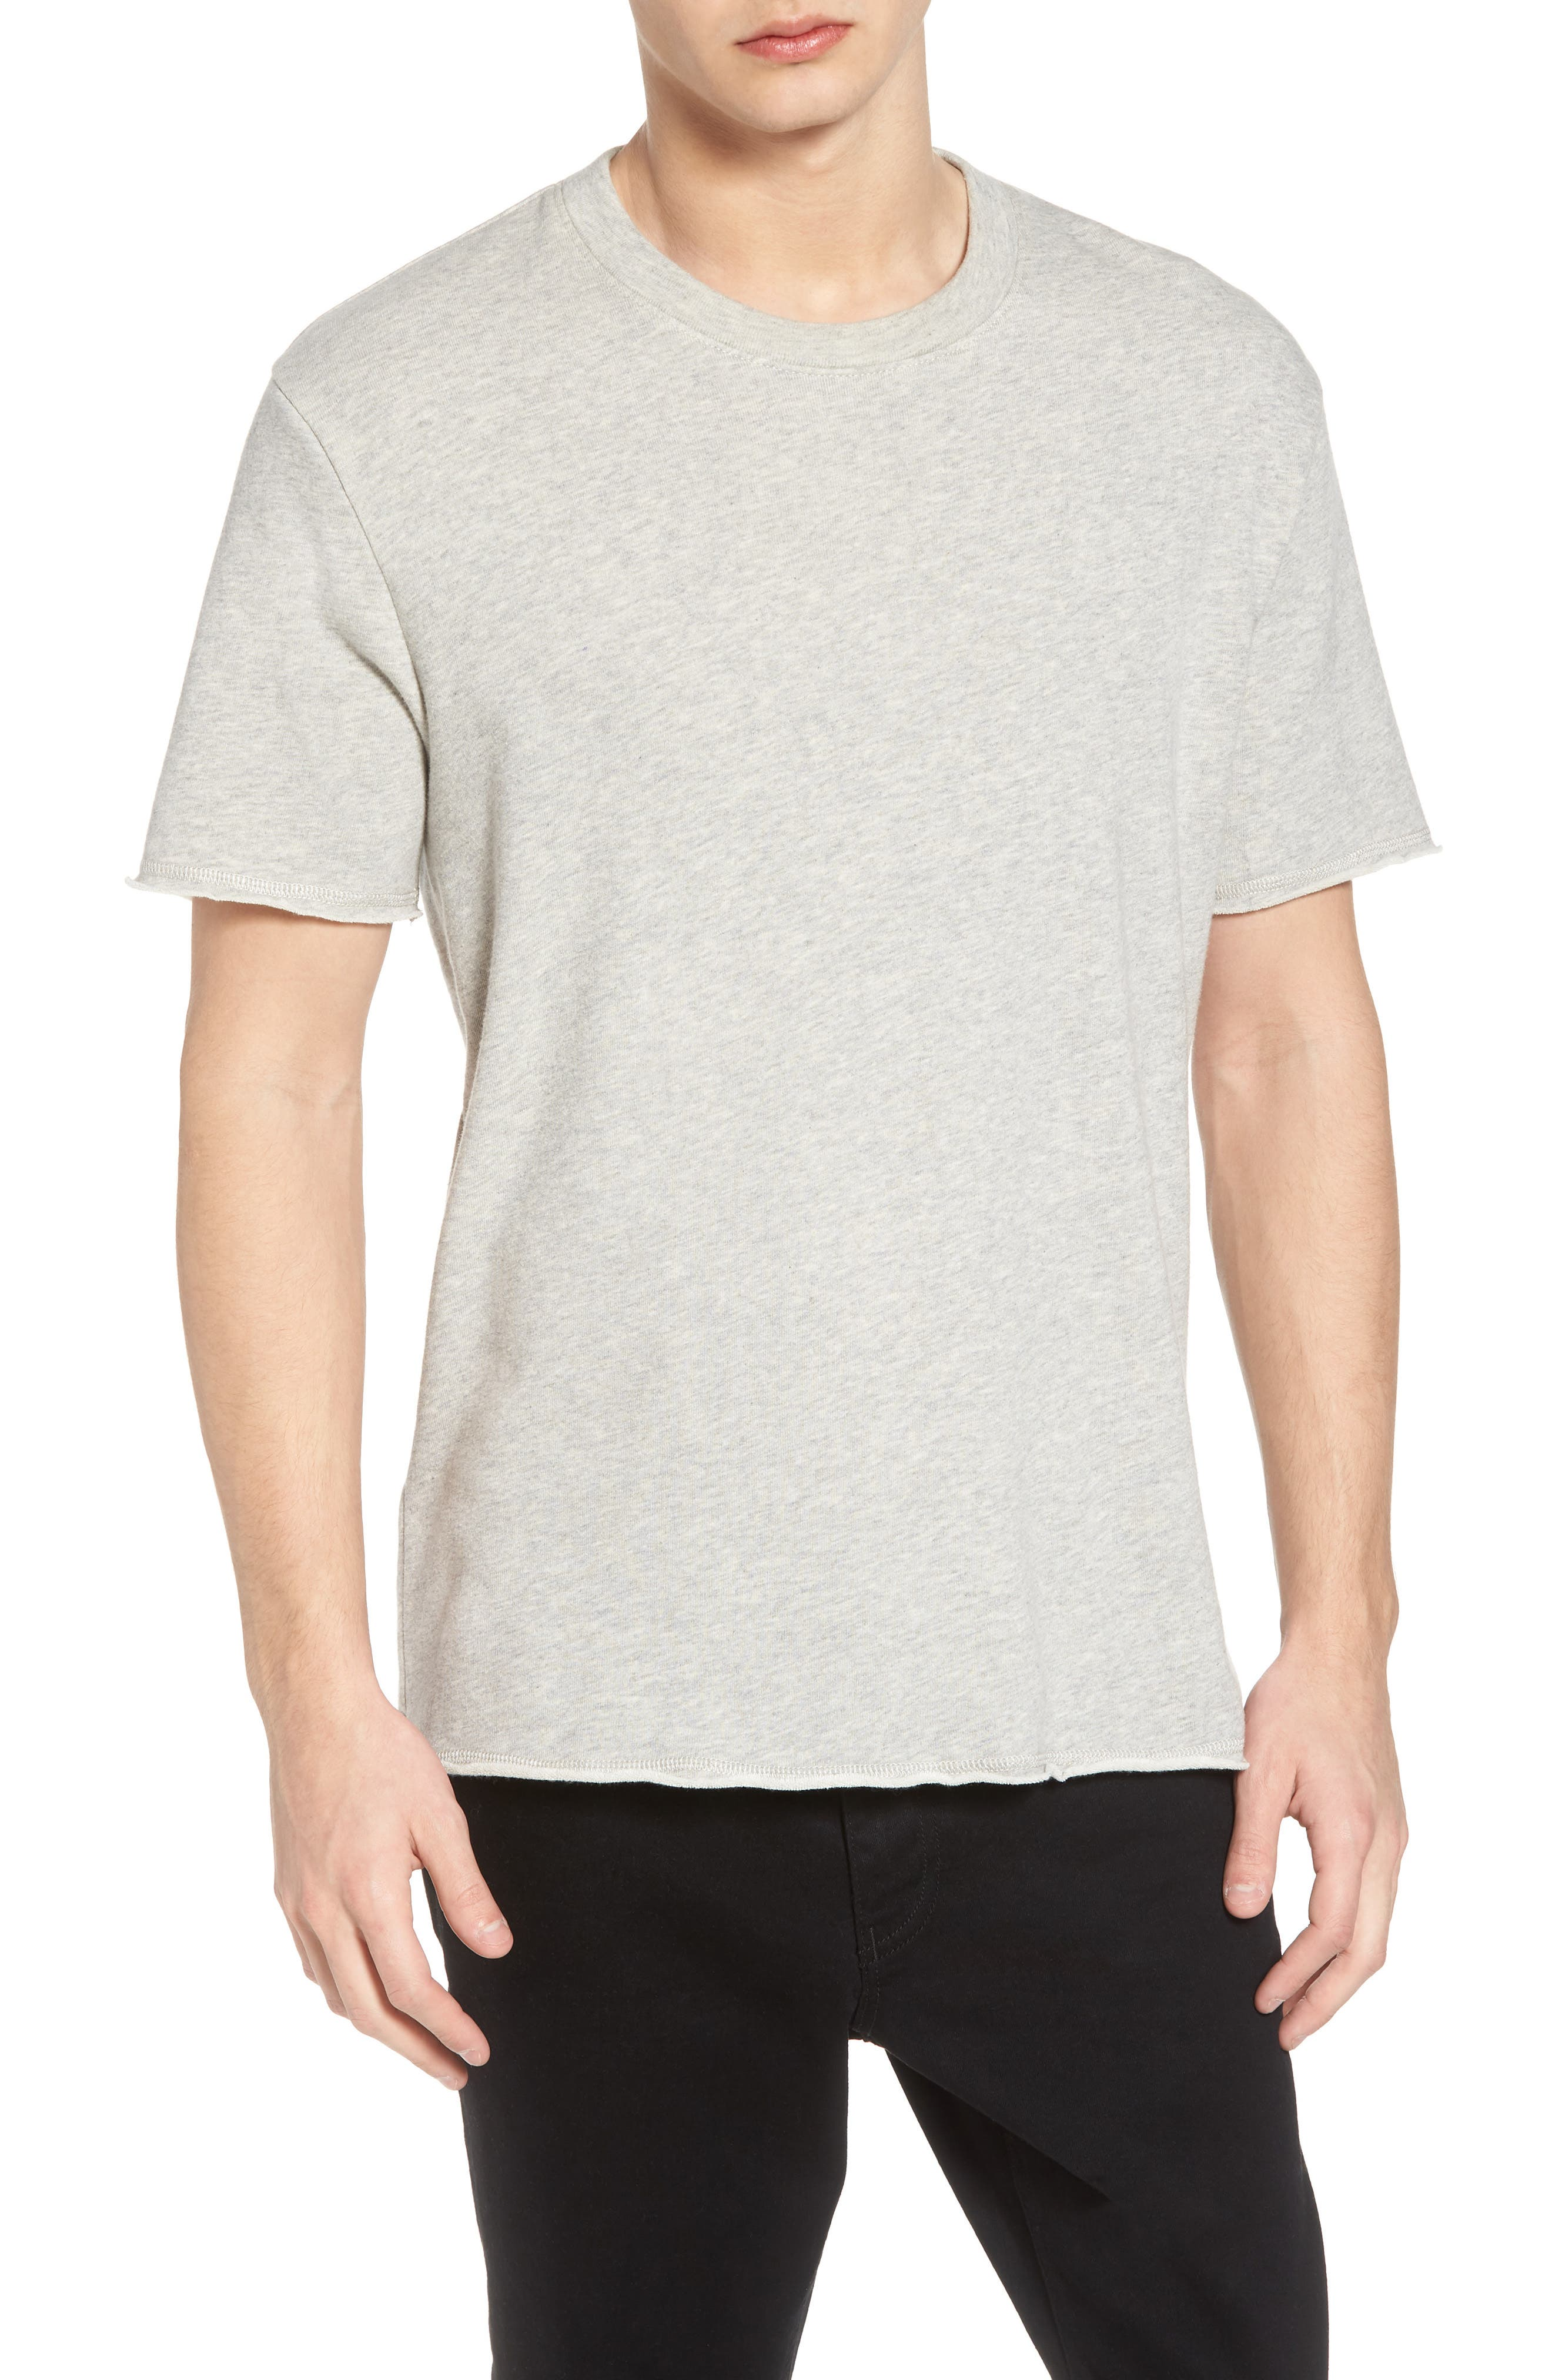 Treasure & Bond Towel T-Shirt